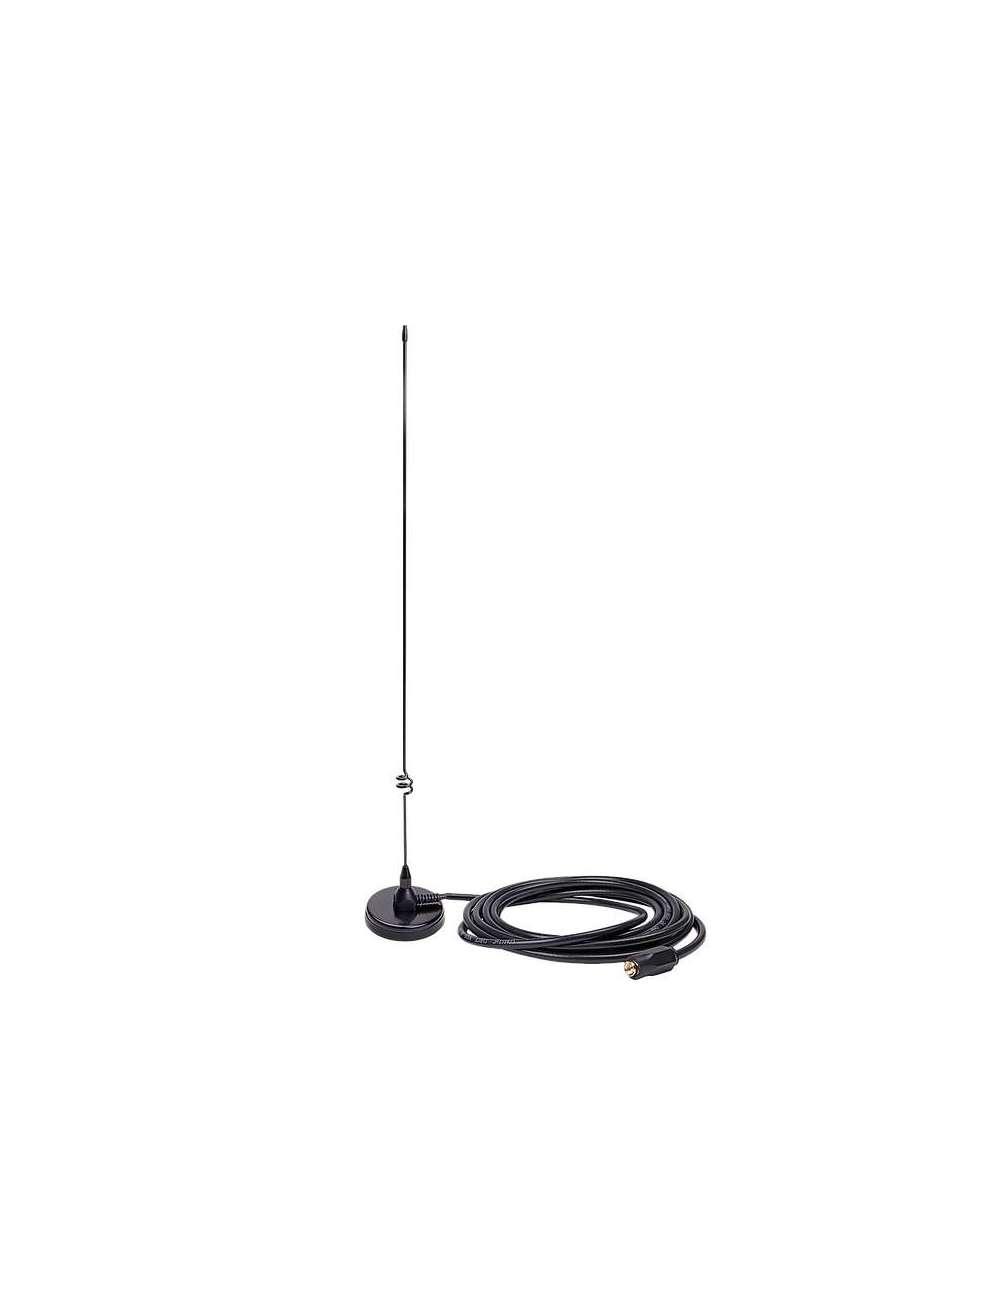 antenne de toit standart Supra pour Garmin